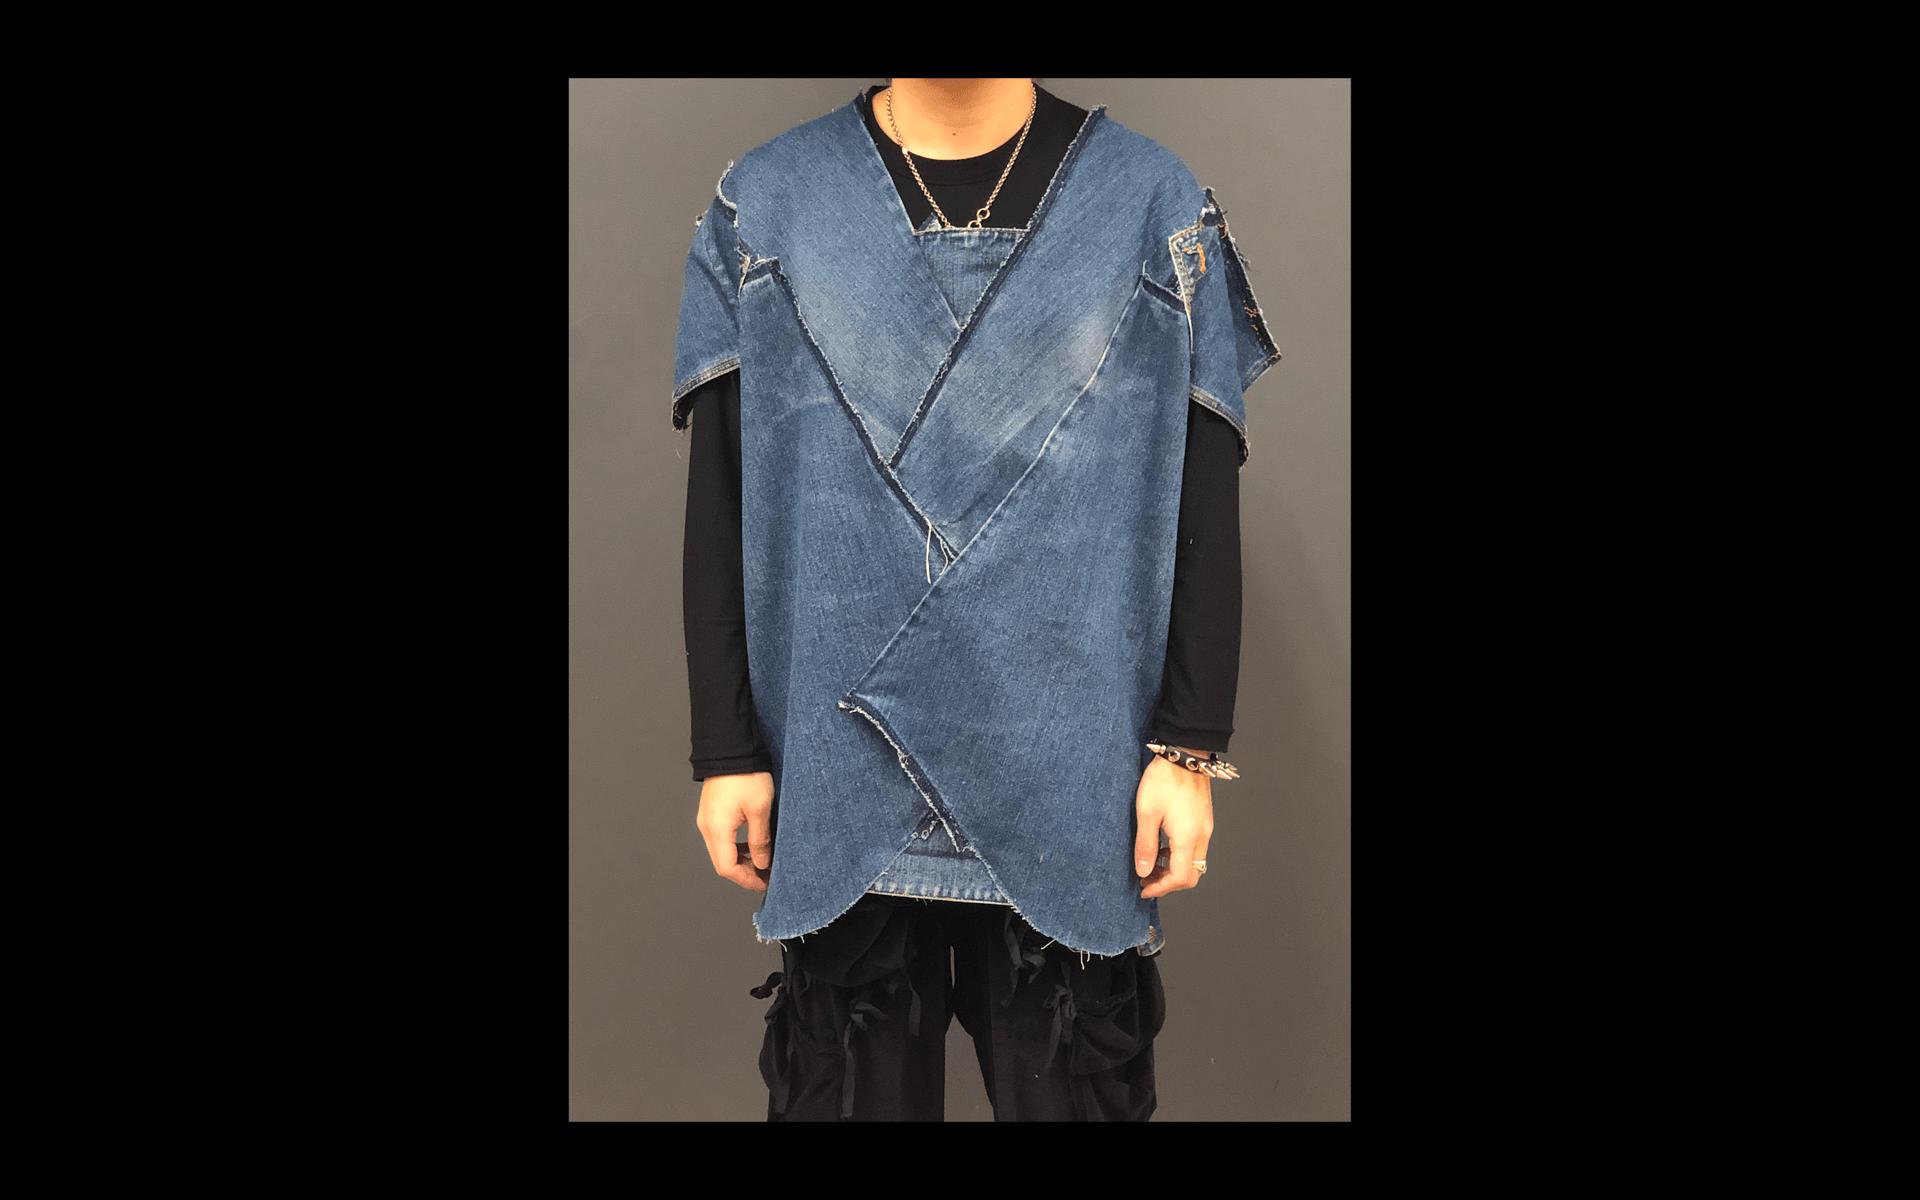 denim oversized t-shirts inspired by Yohji Yamamoto